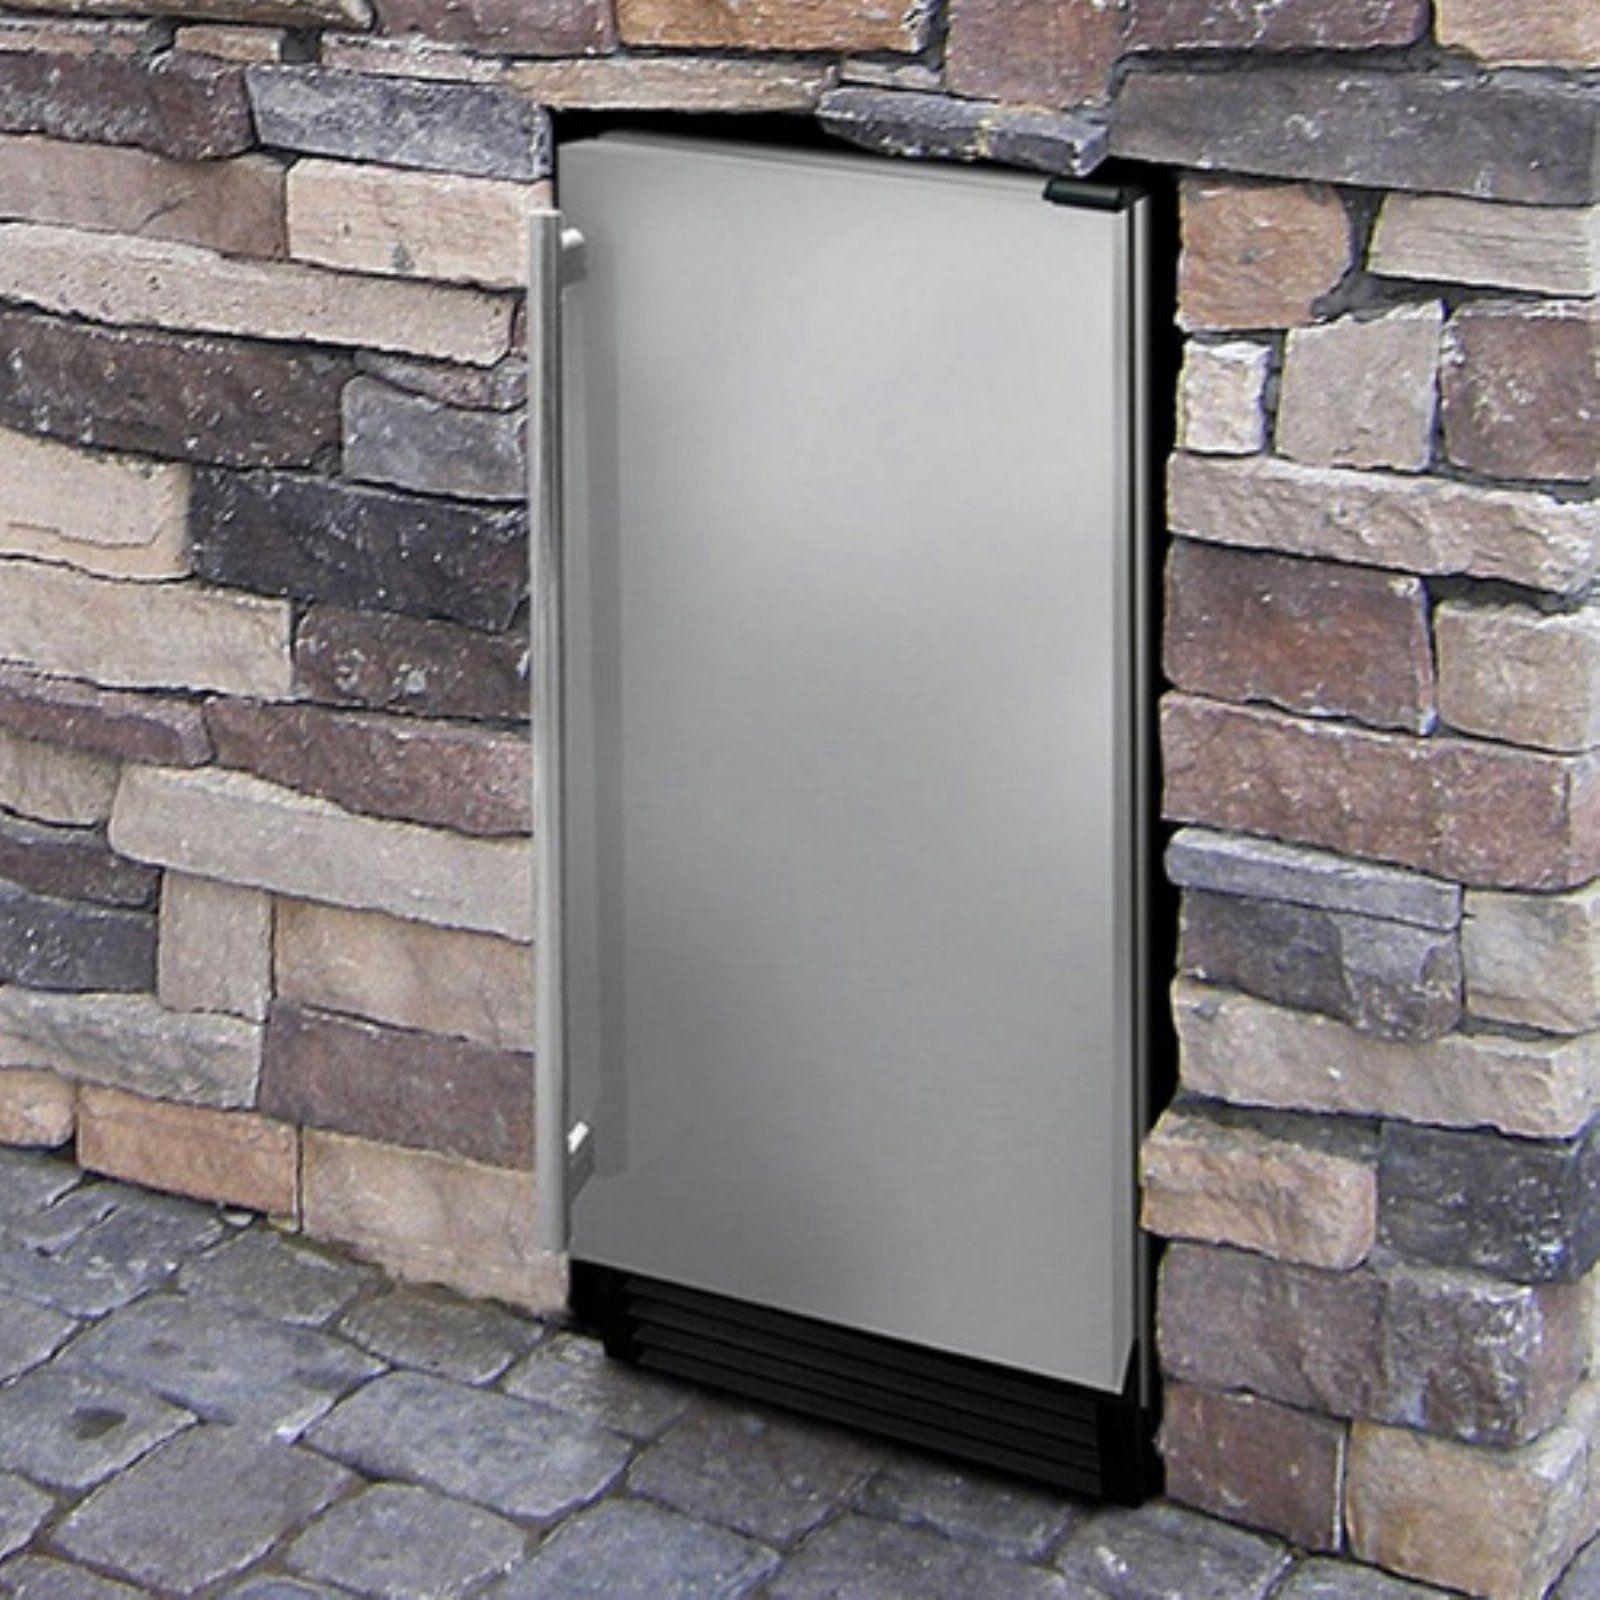 10++ Outdoor kitchen appliances near me ideas